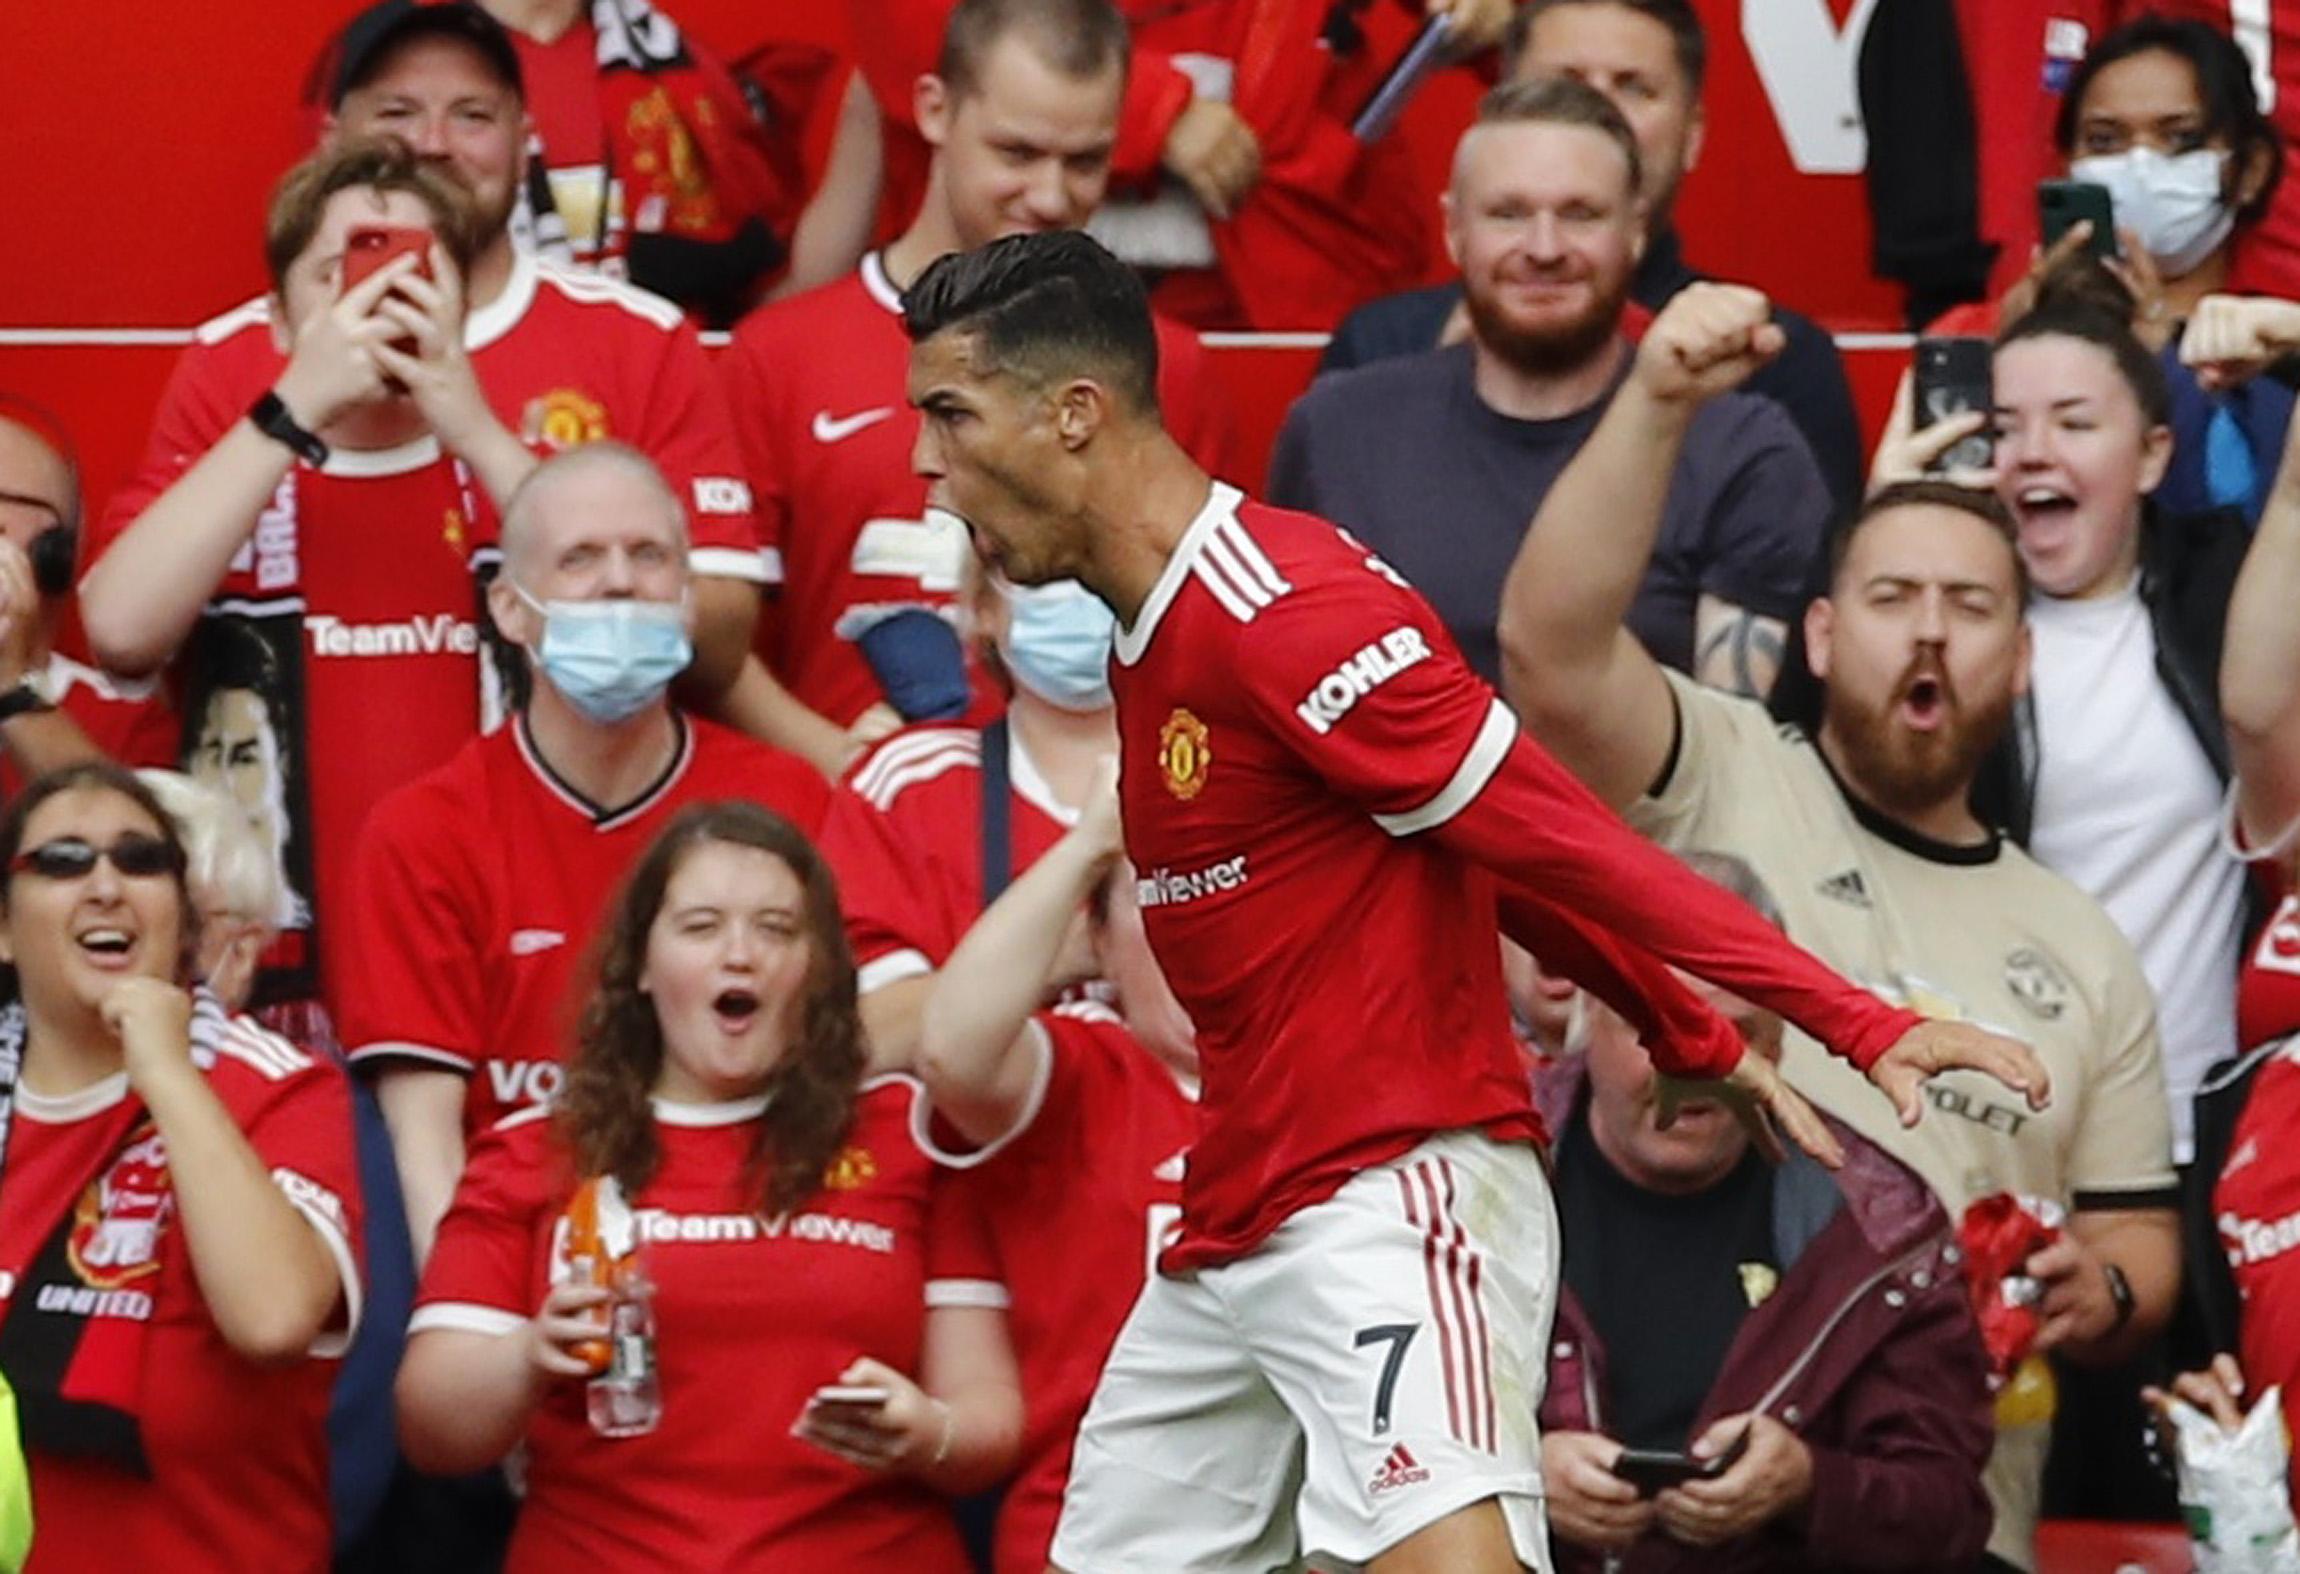 Ronaldo debut double as Man Utd thrash Newcastle to go top | Reuters